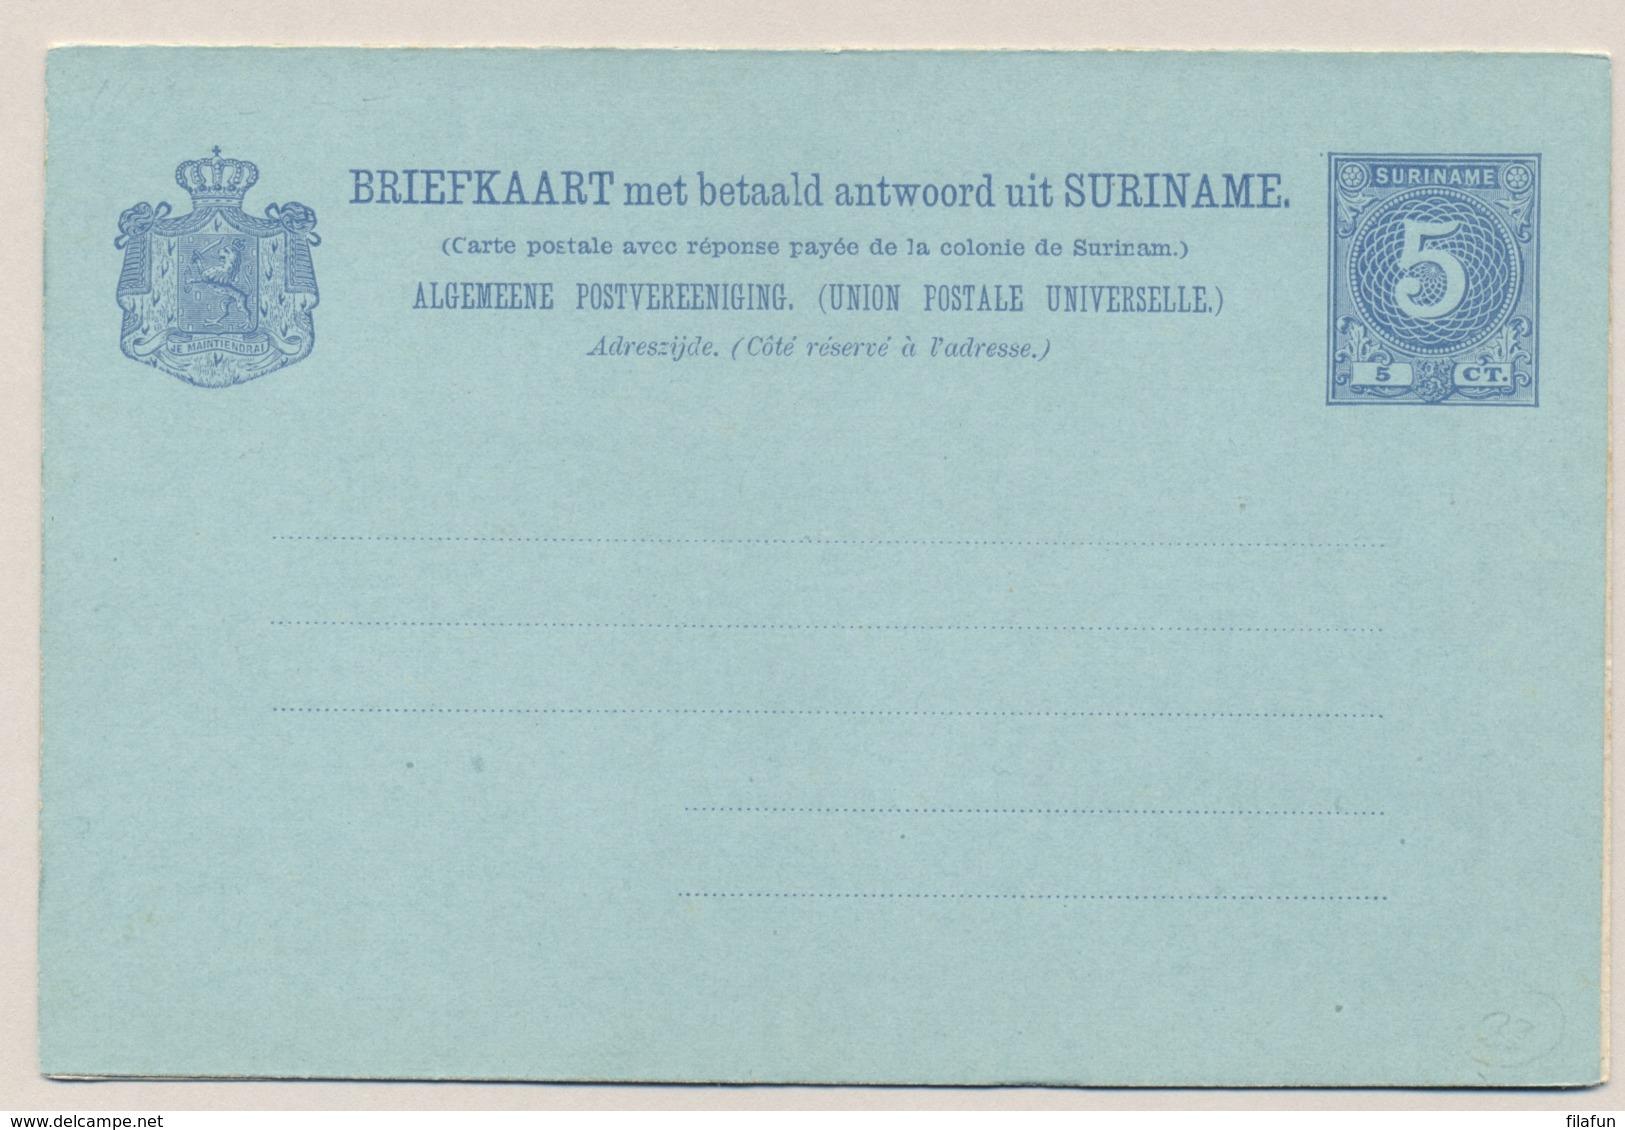 Suriname - 1906 - 5+5 Cent Cijfer, Briefkaart G14 - Ongebruikt - Suriname ... - 1975